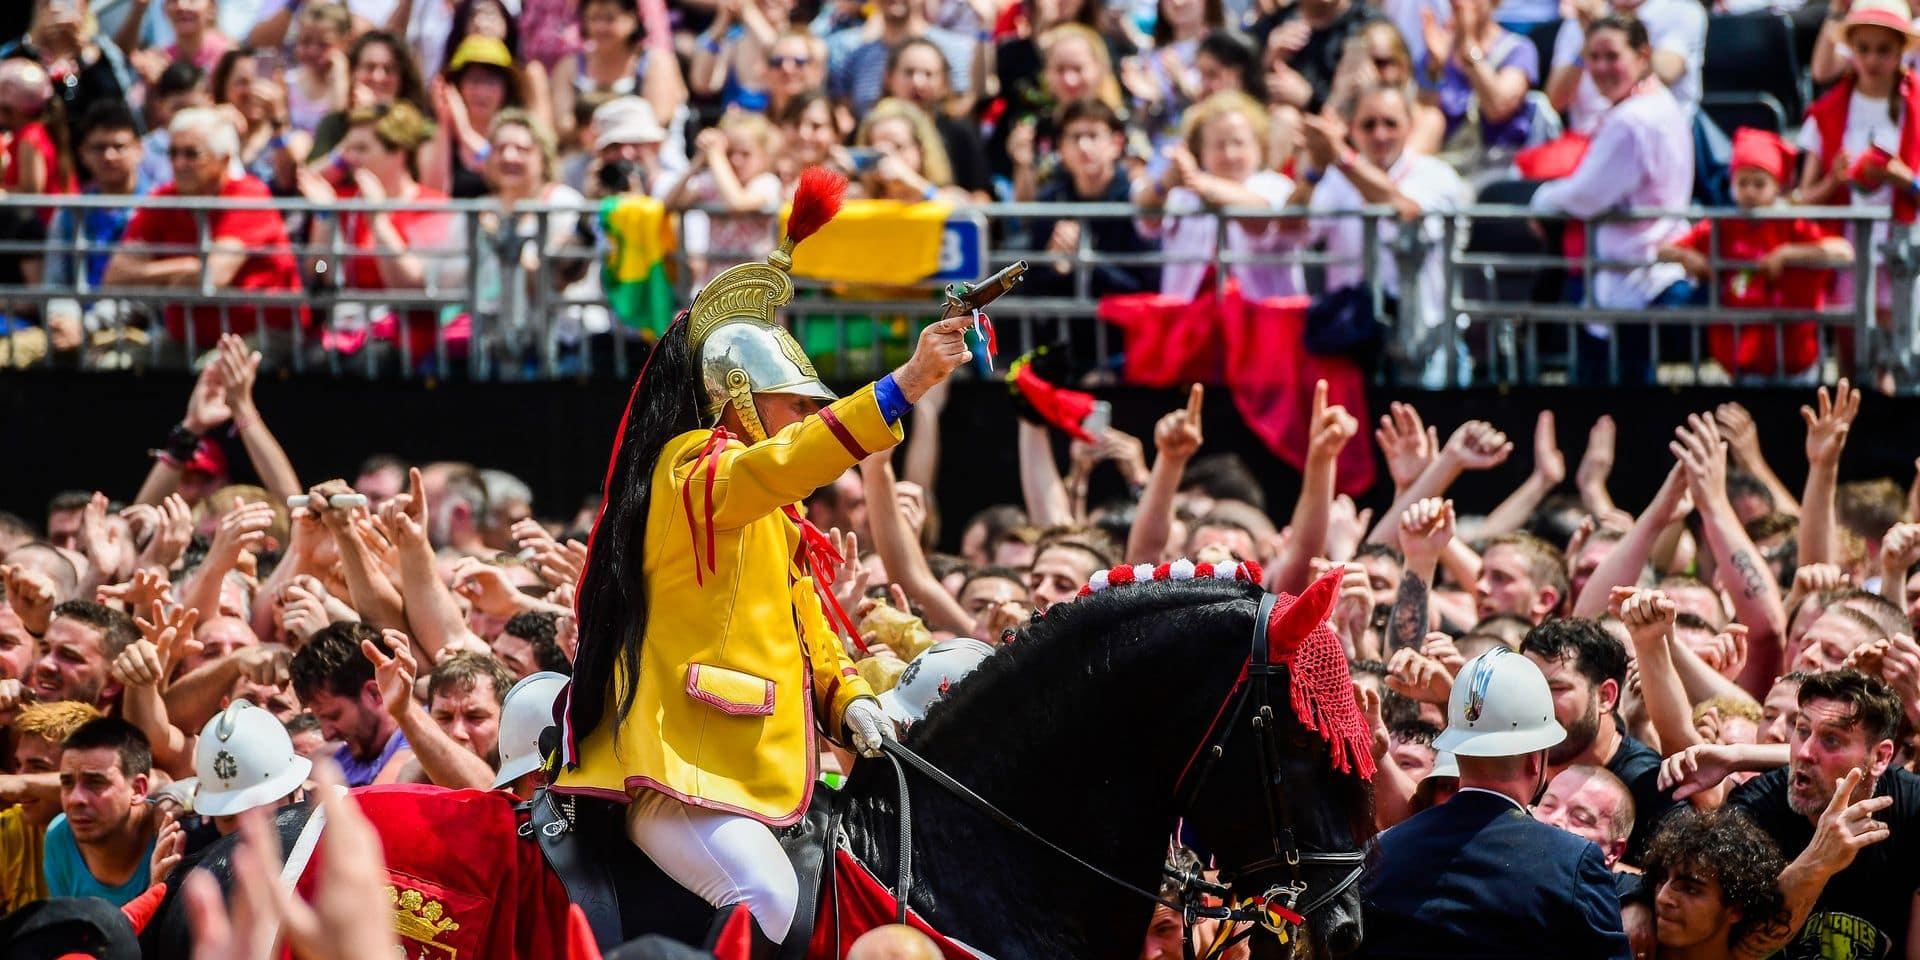 La Ducasse de Mons entrera dans son chapitre rituel samedi soir